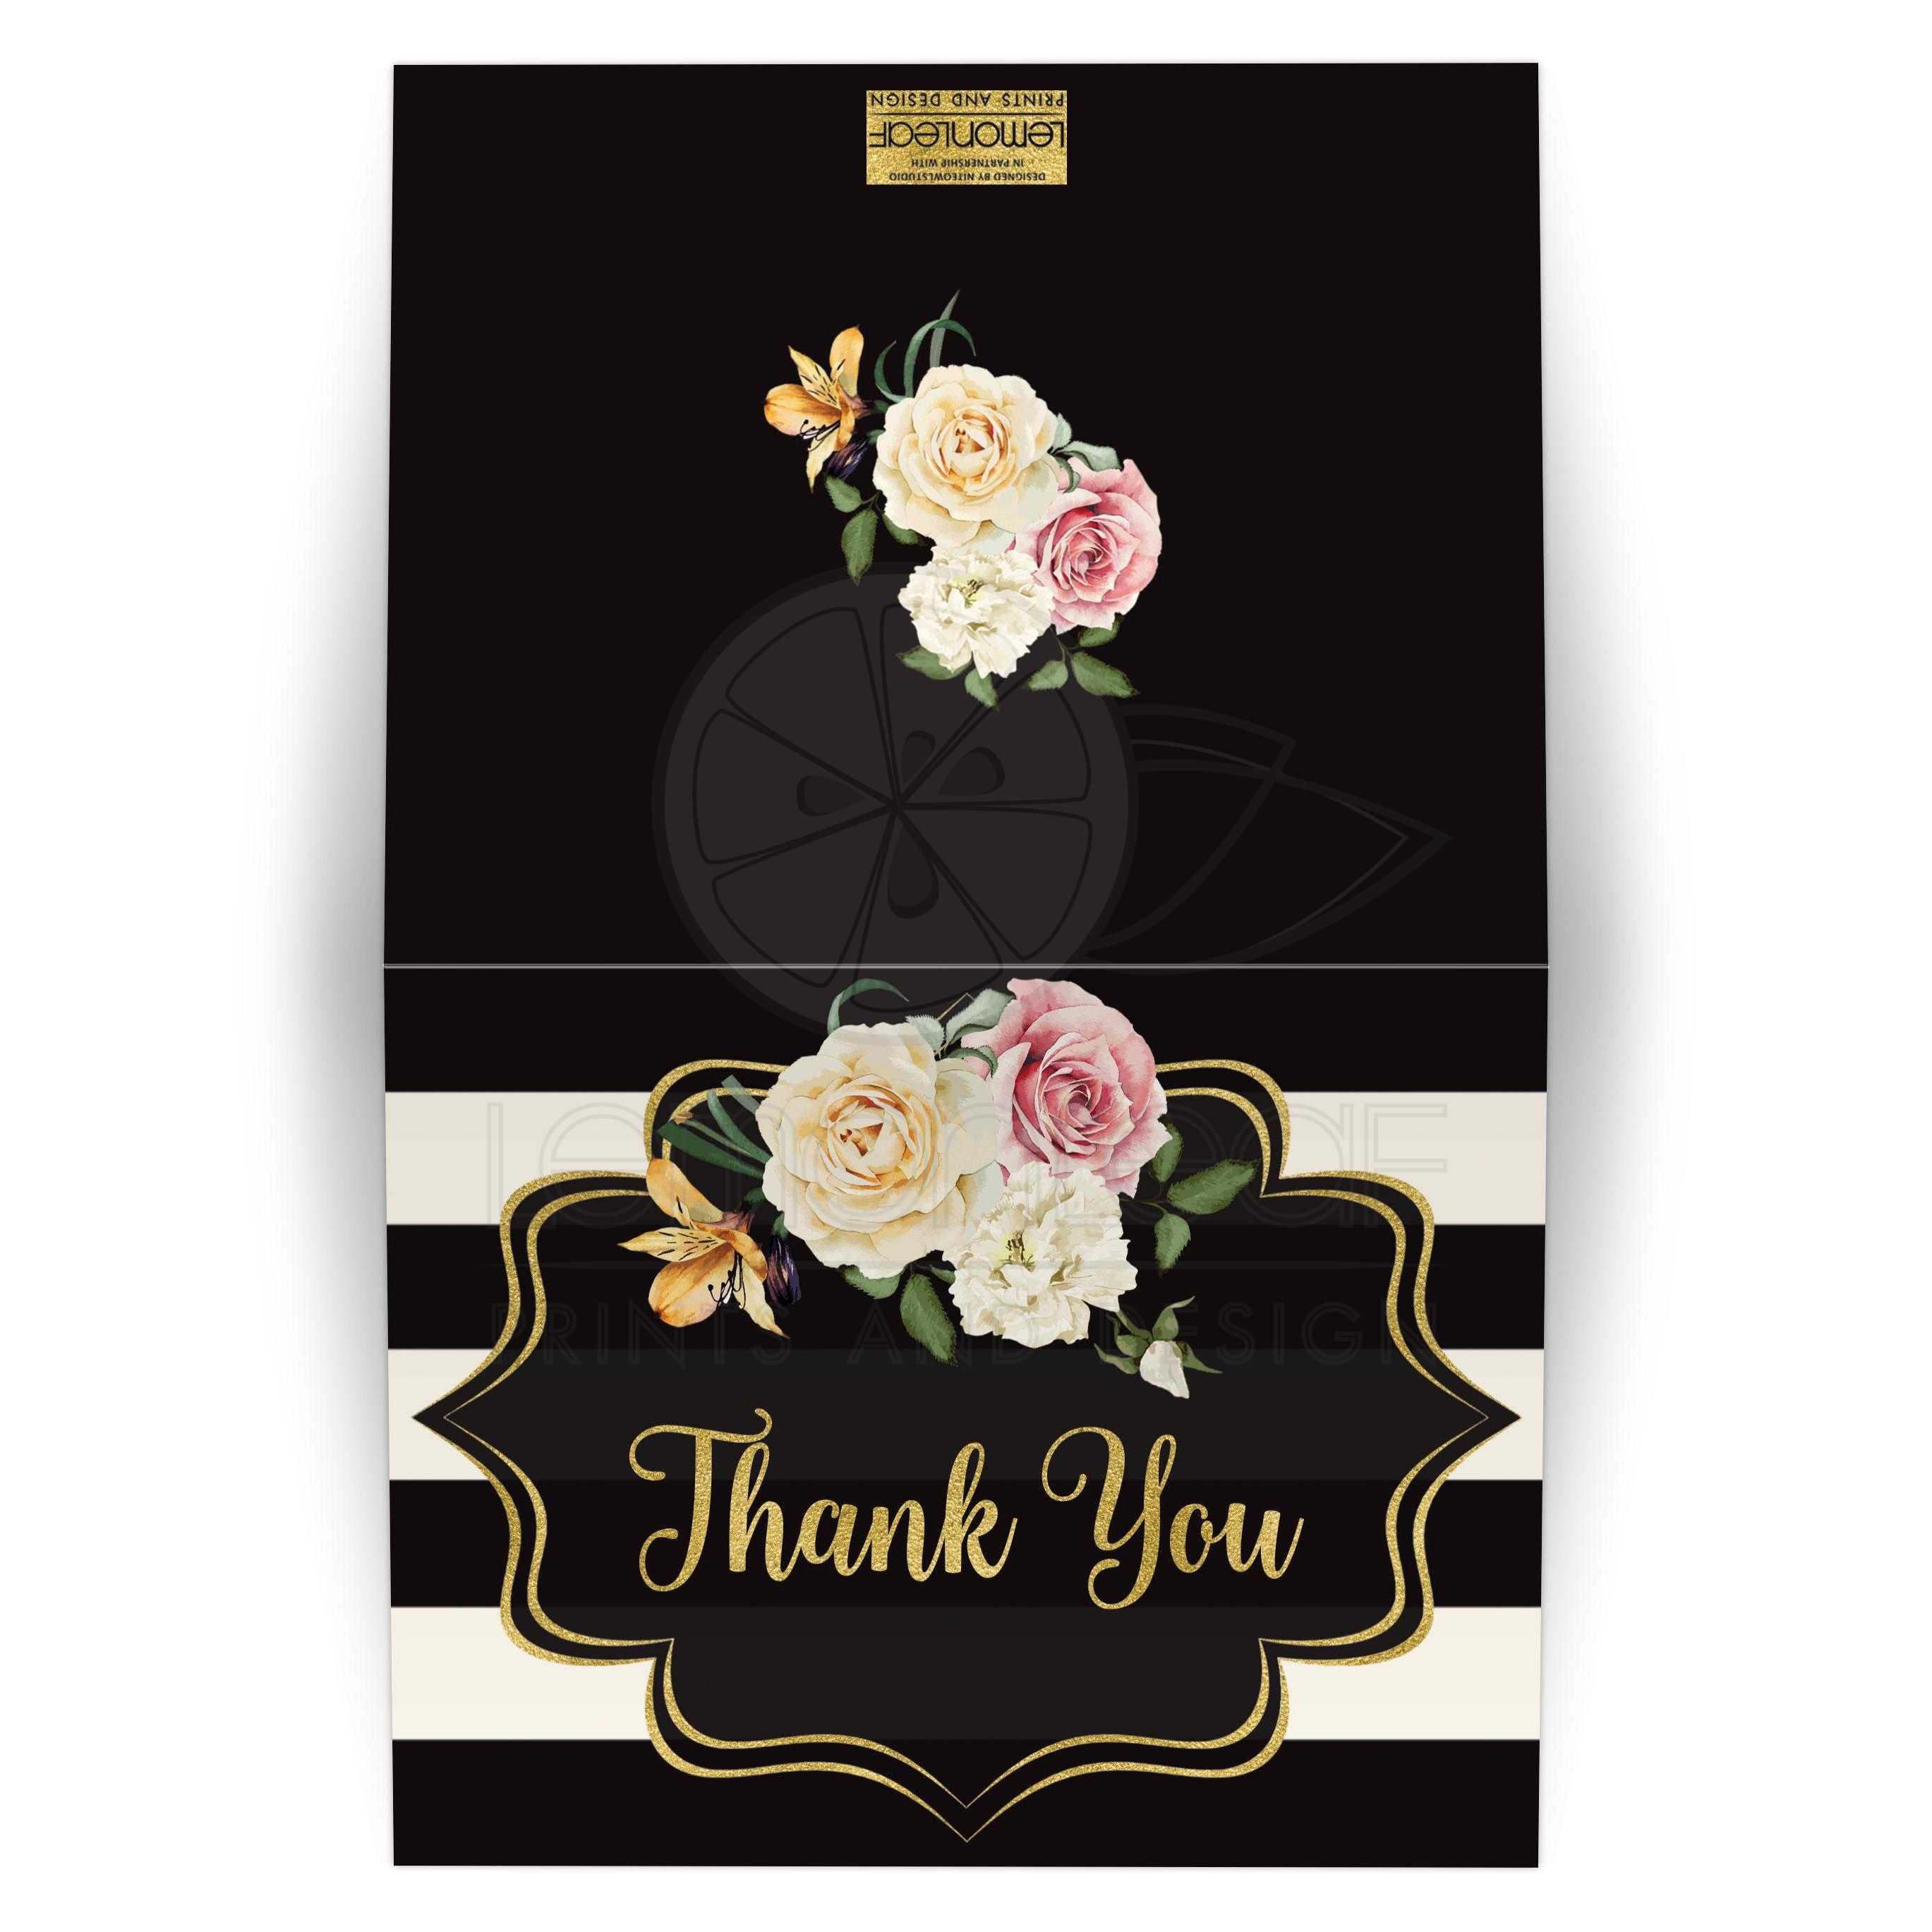 Thank you sign //// wedding prints //// gold foil //// gold wedding //// thank you ////